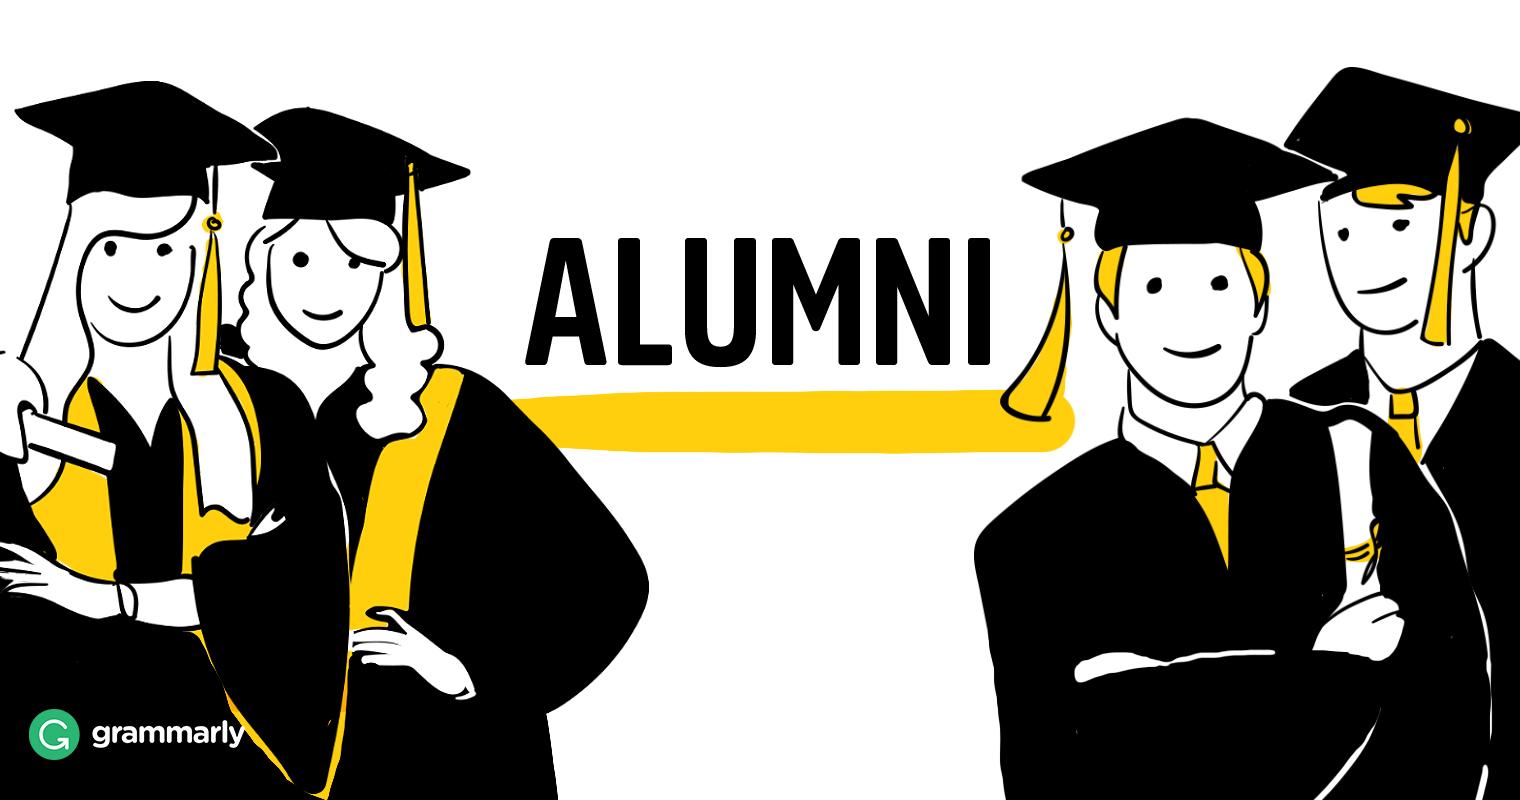 Alumni visual definition